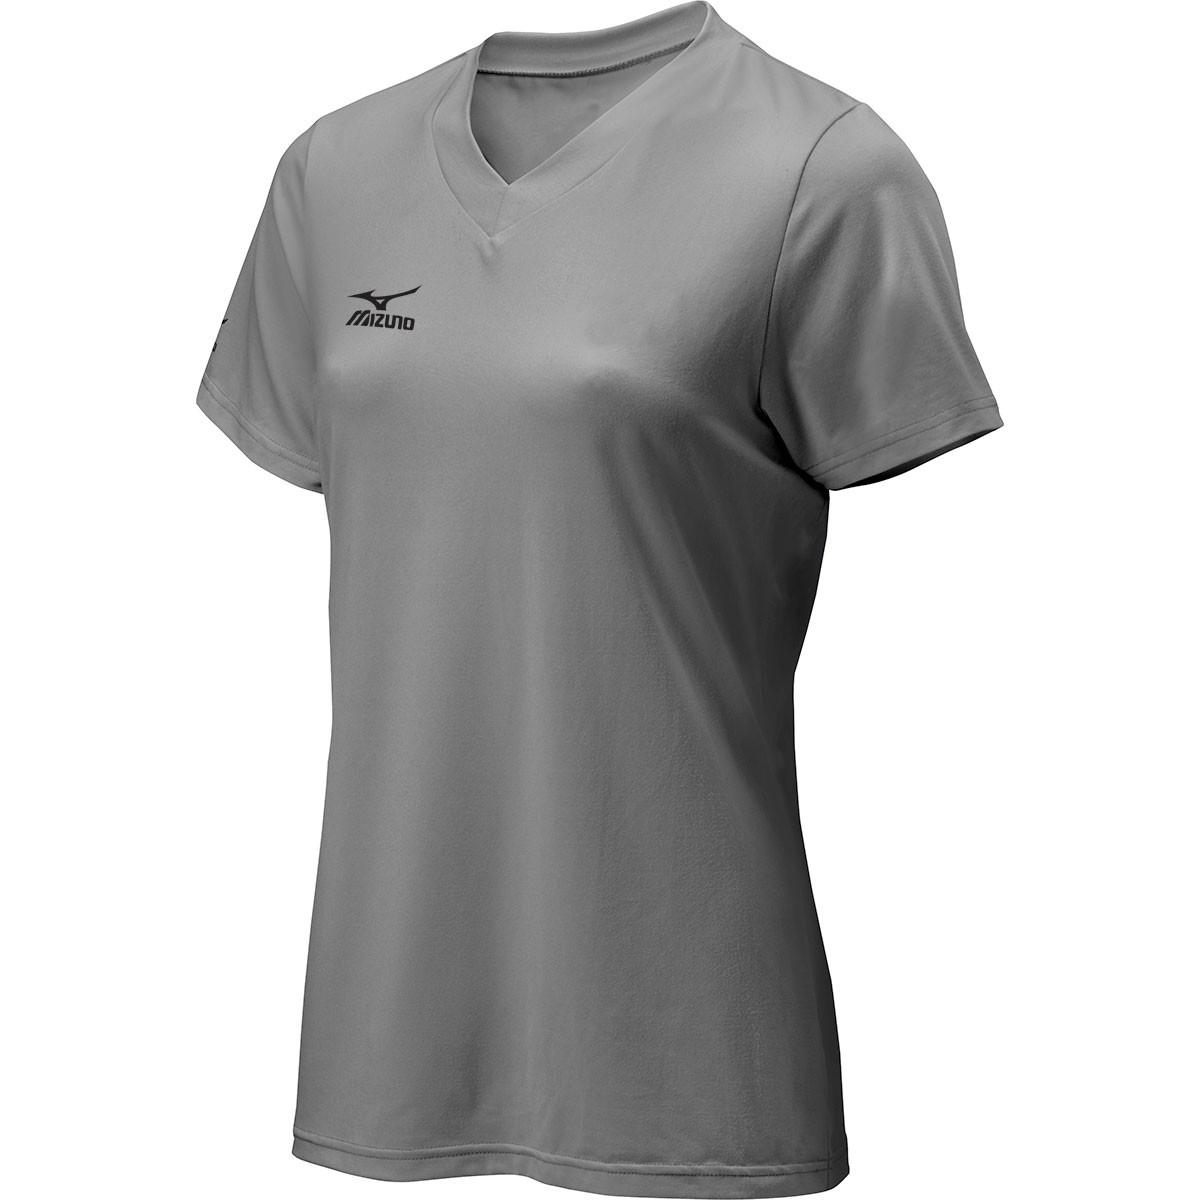 Grey Jersey 2014